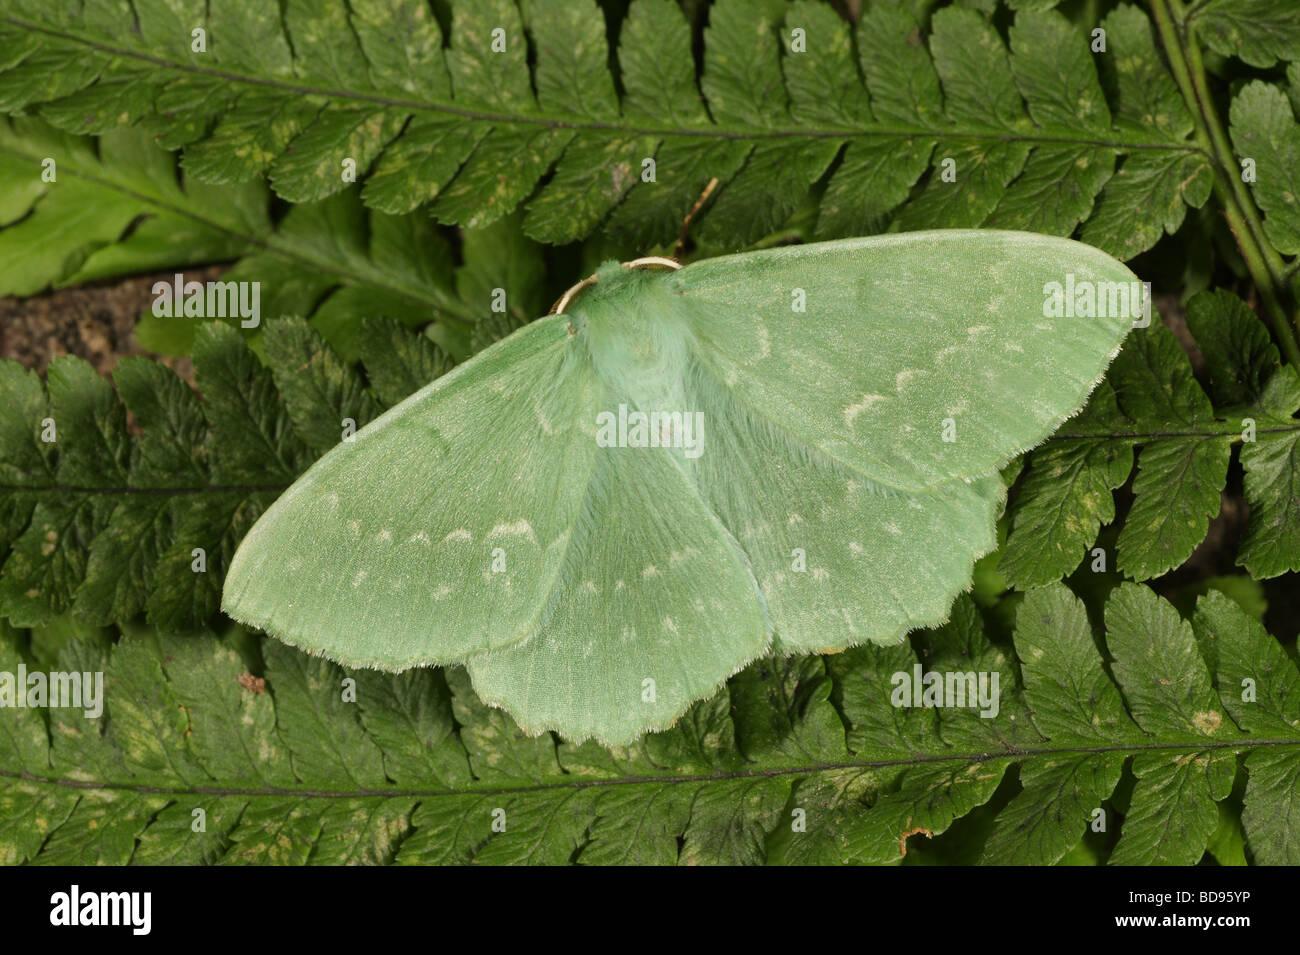 Großer Smaragd - Geometra papilionaria Stockbild